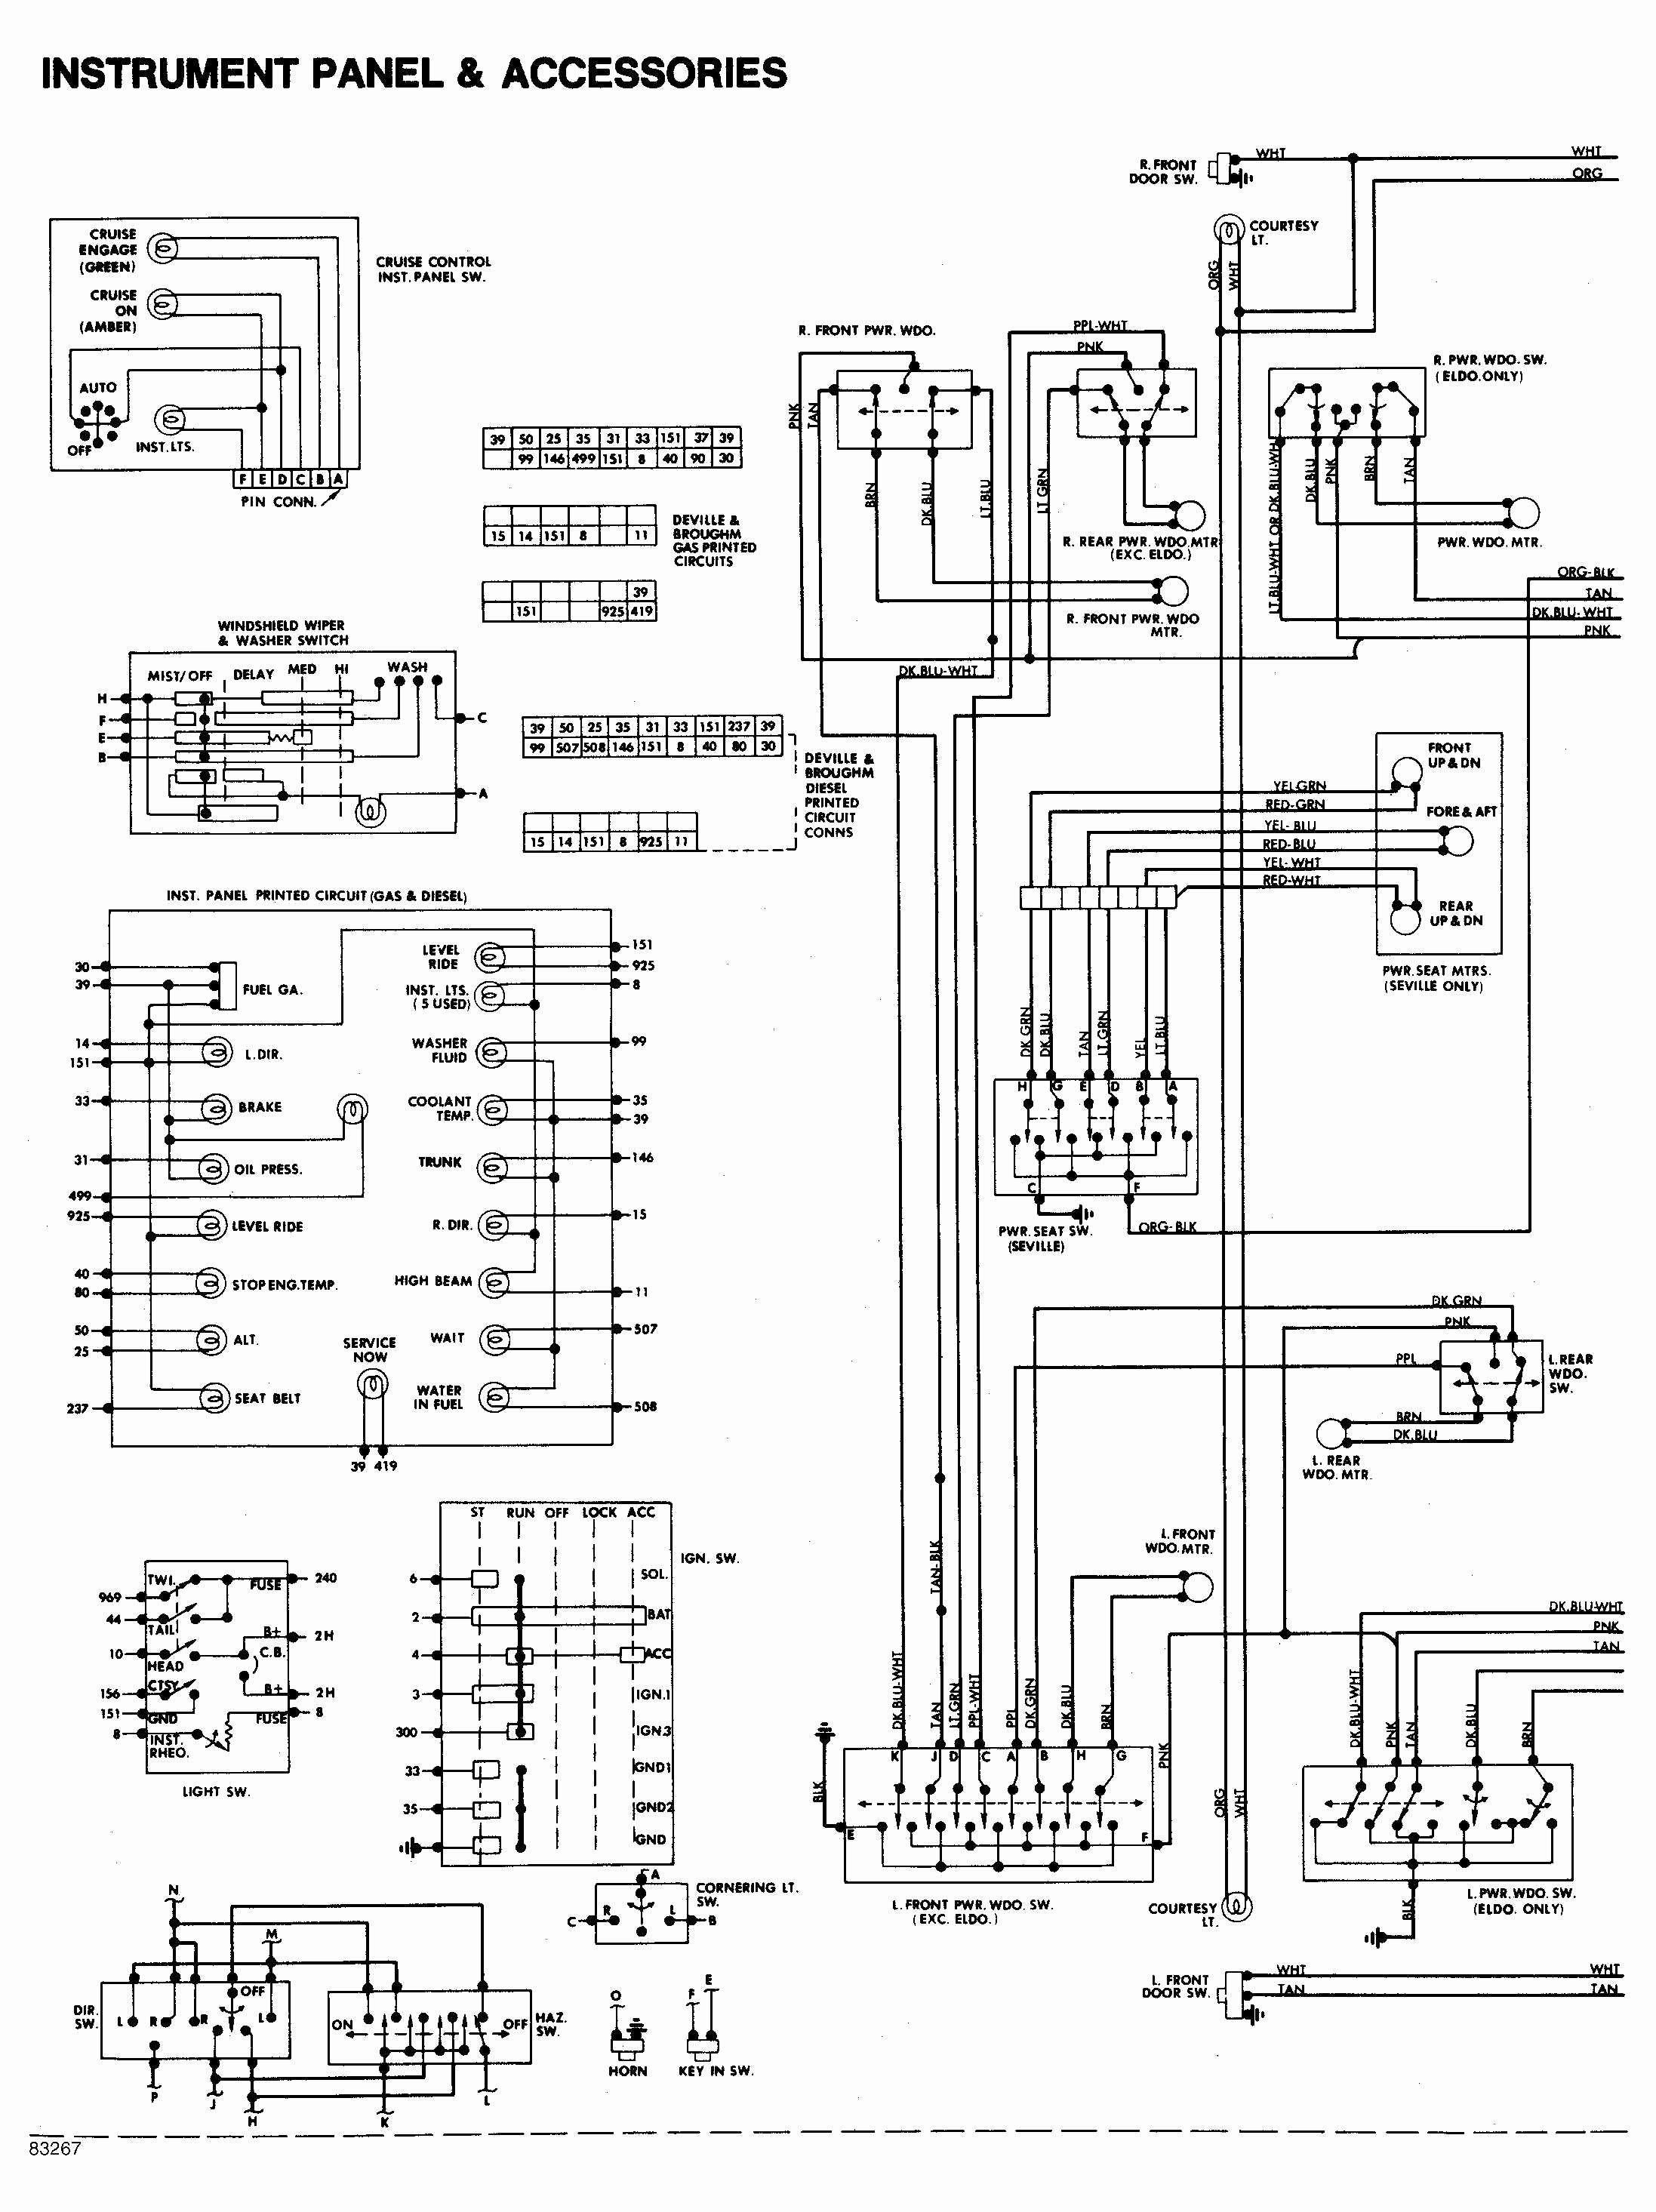 2003 civic wiring diagram 2003 civic wiring diagram e1 wiring diagram 2003 honda civic radio wiring diagram 2003 civic wiring diagram e1 wiring